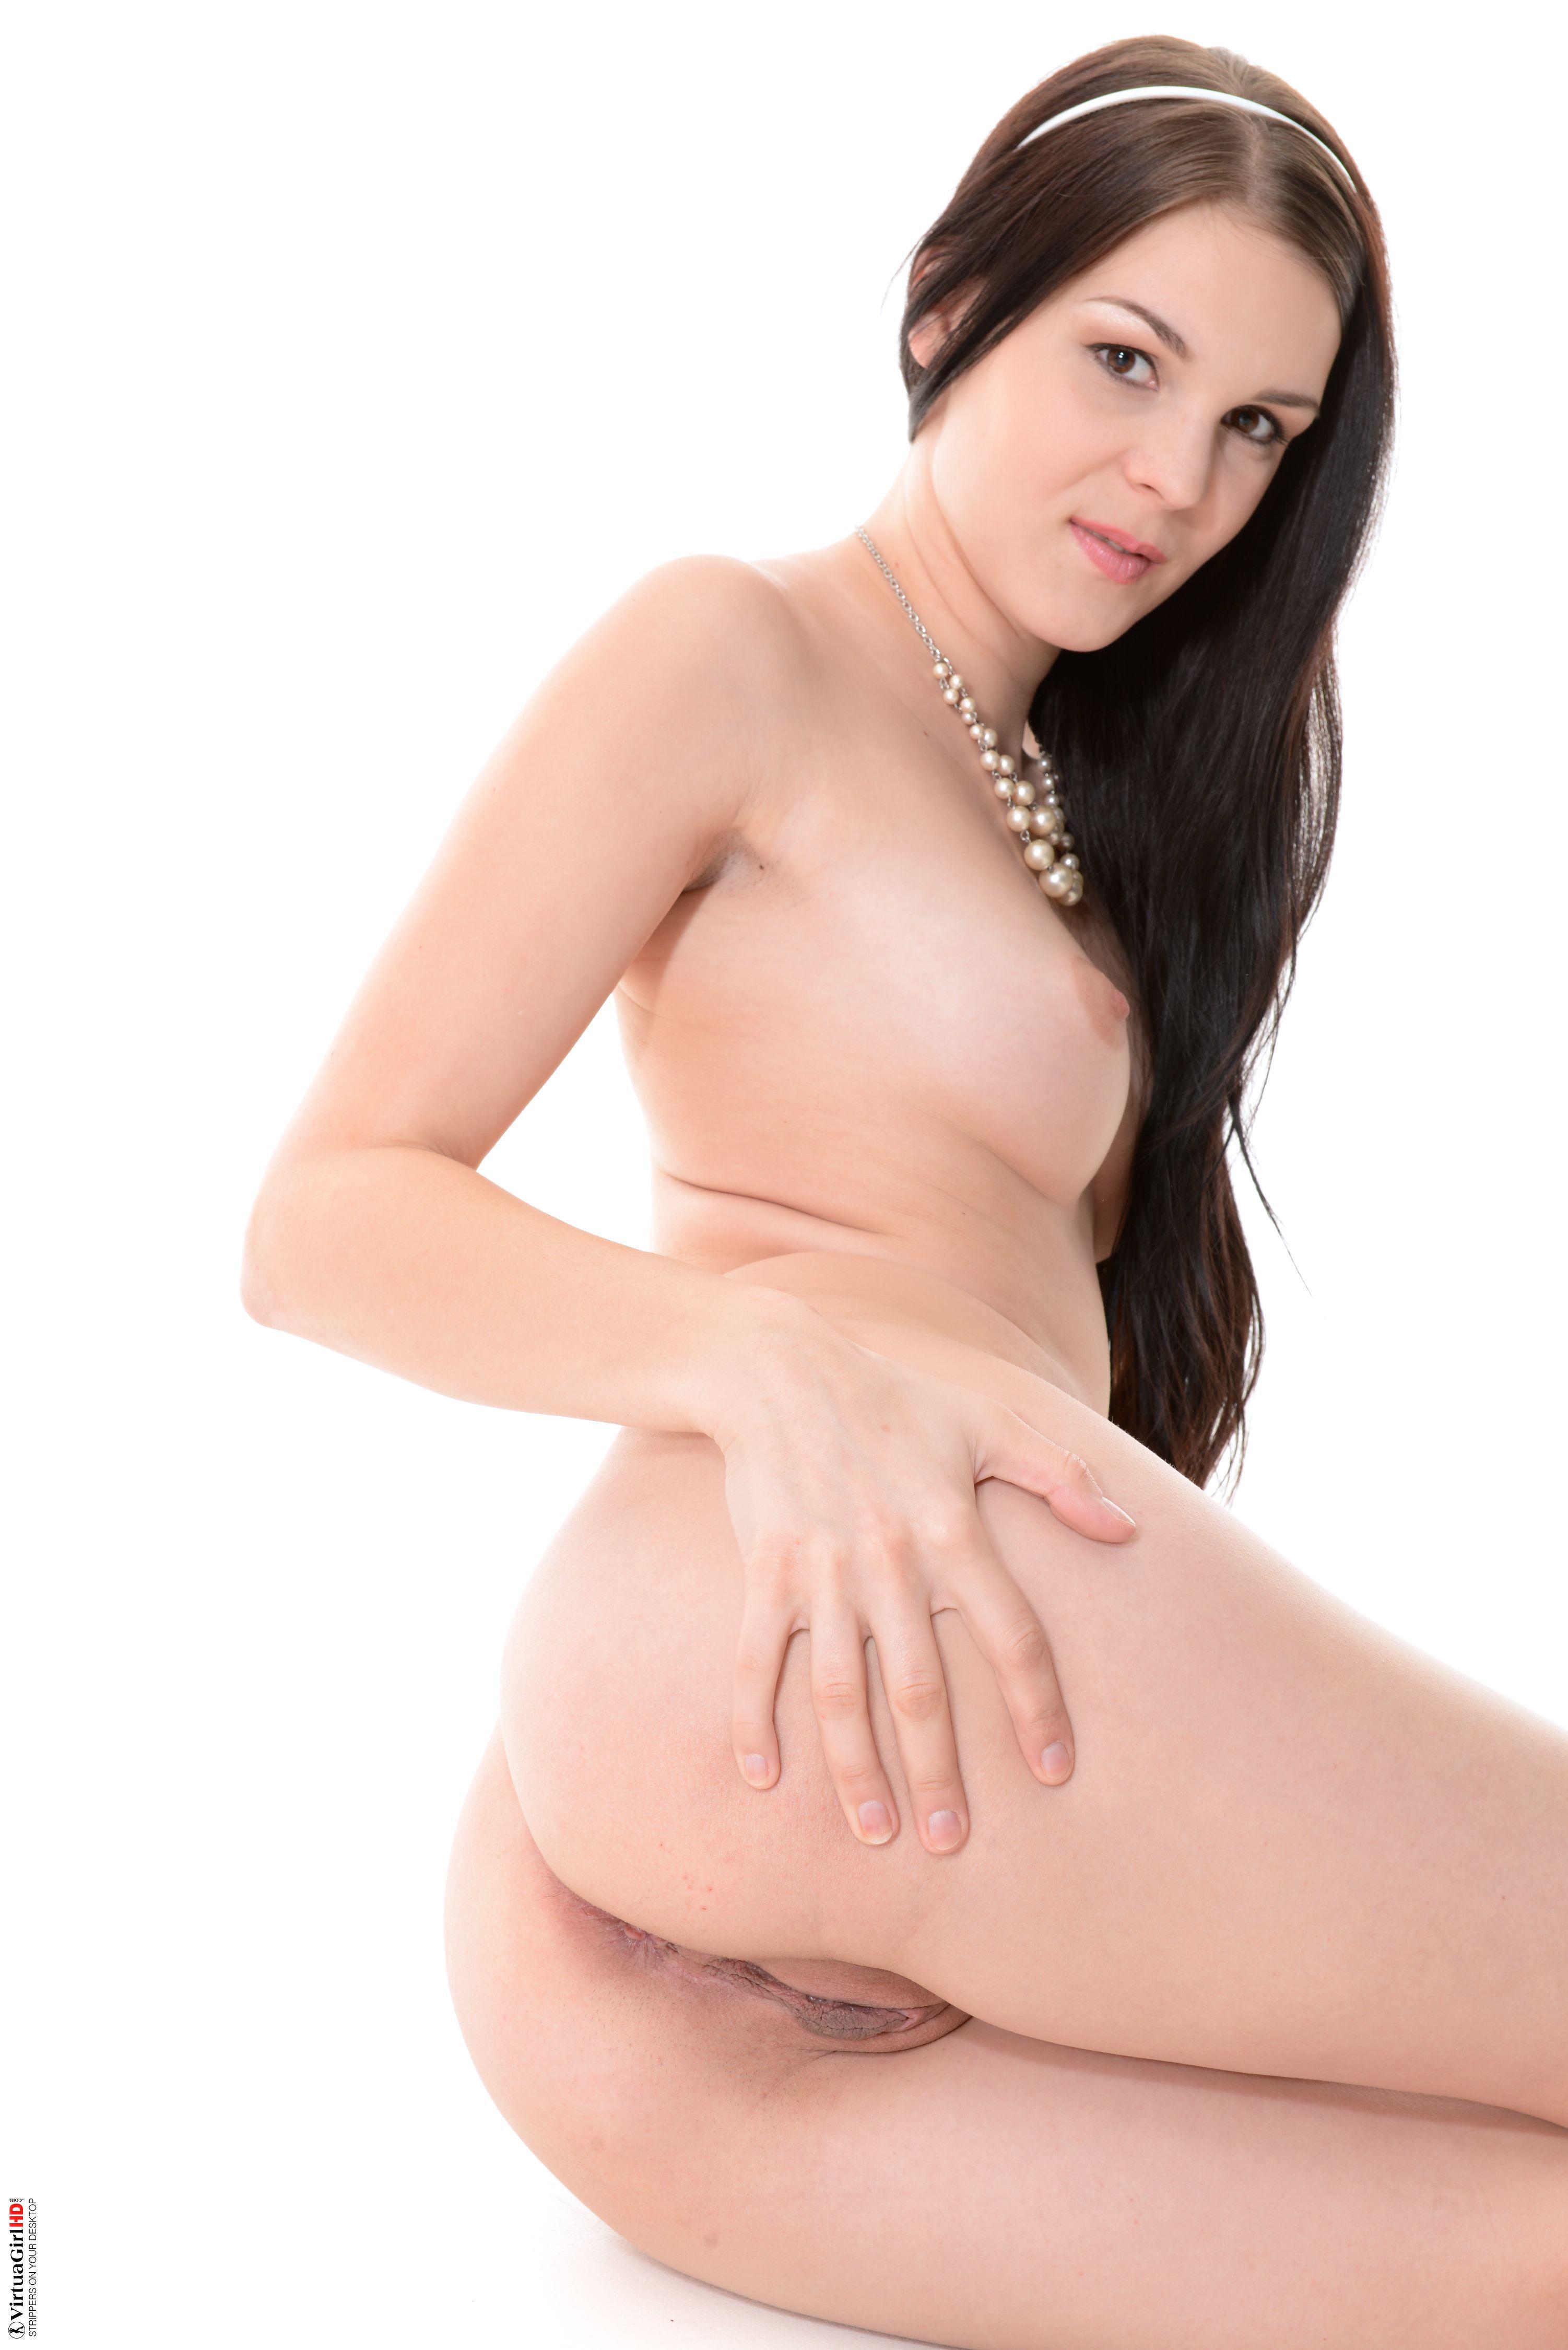 beautiful girls stripping reddit